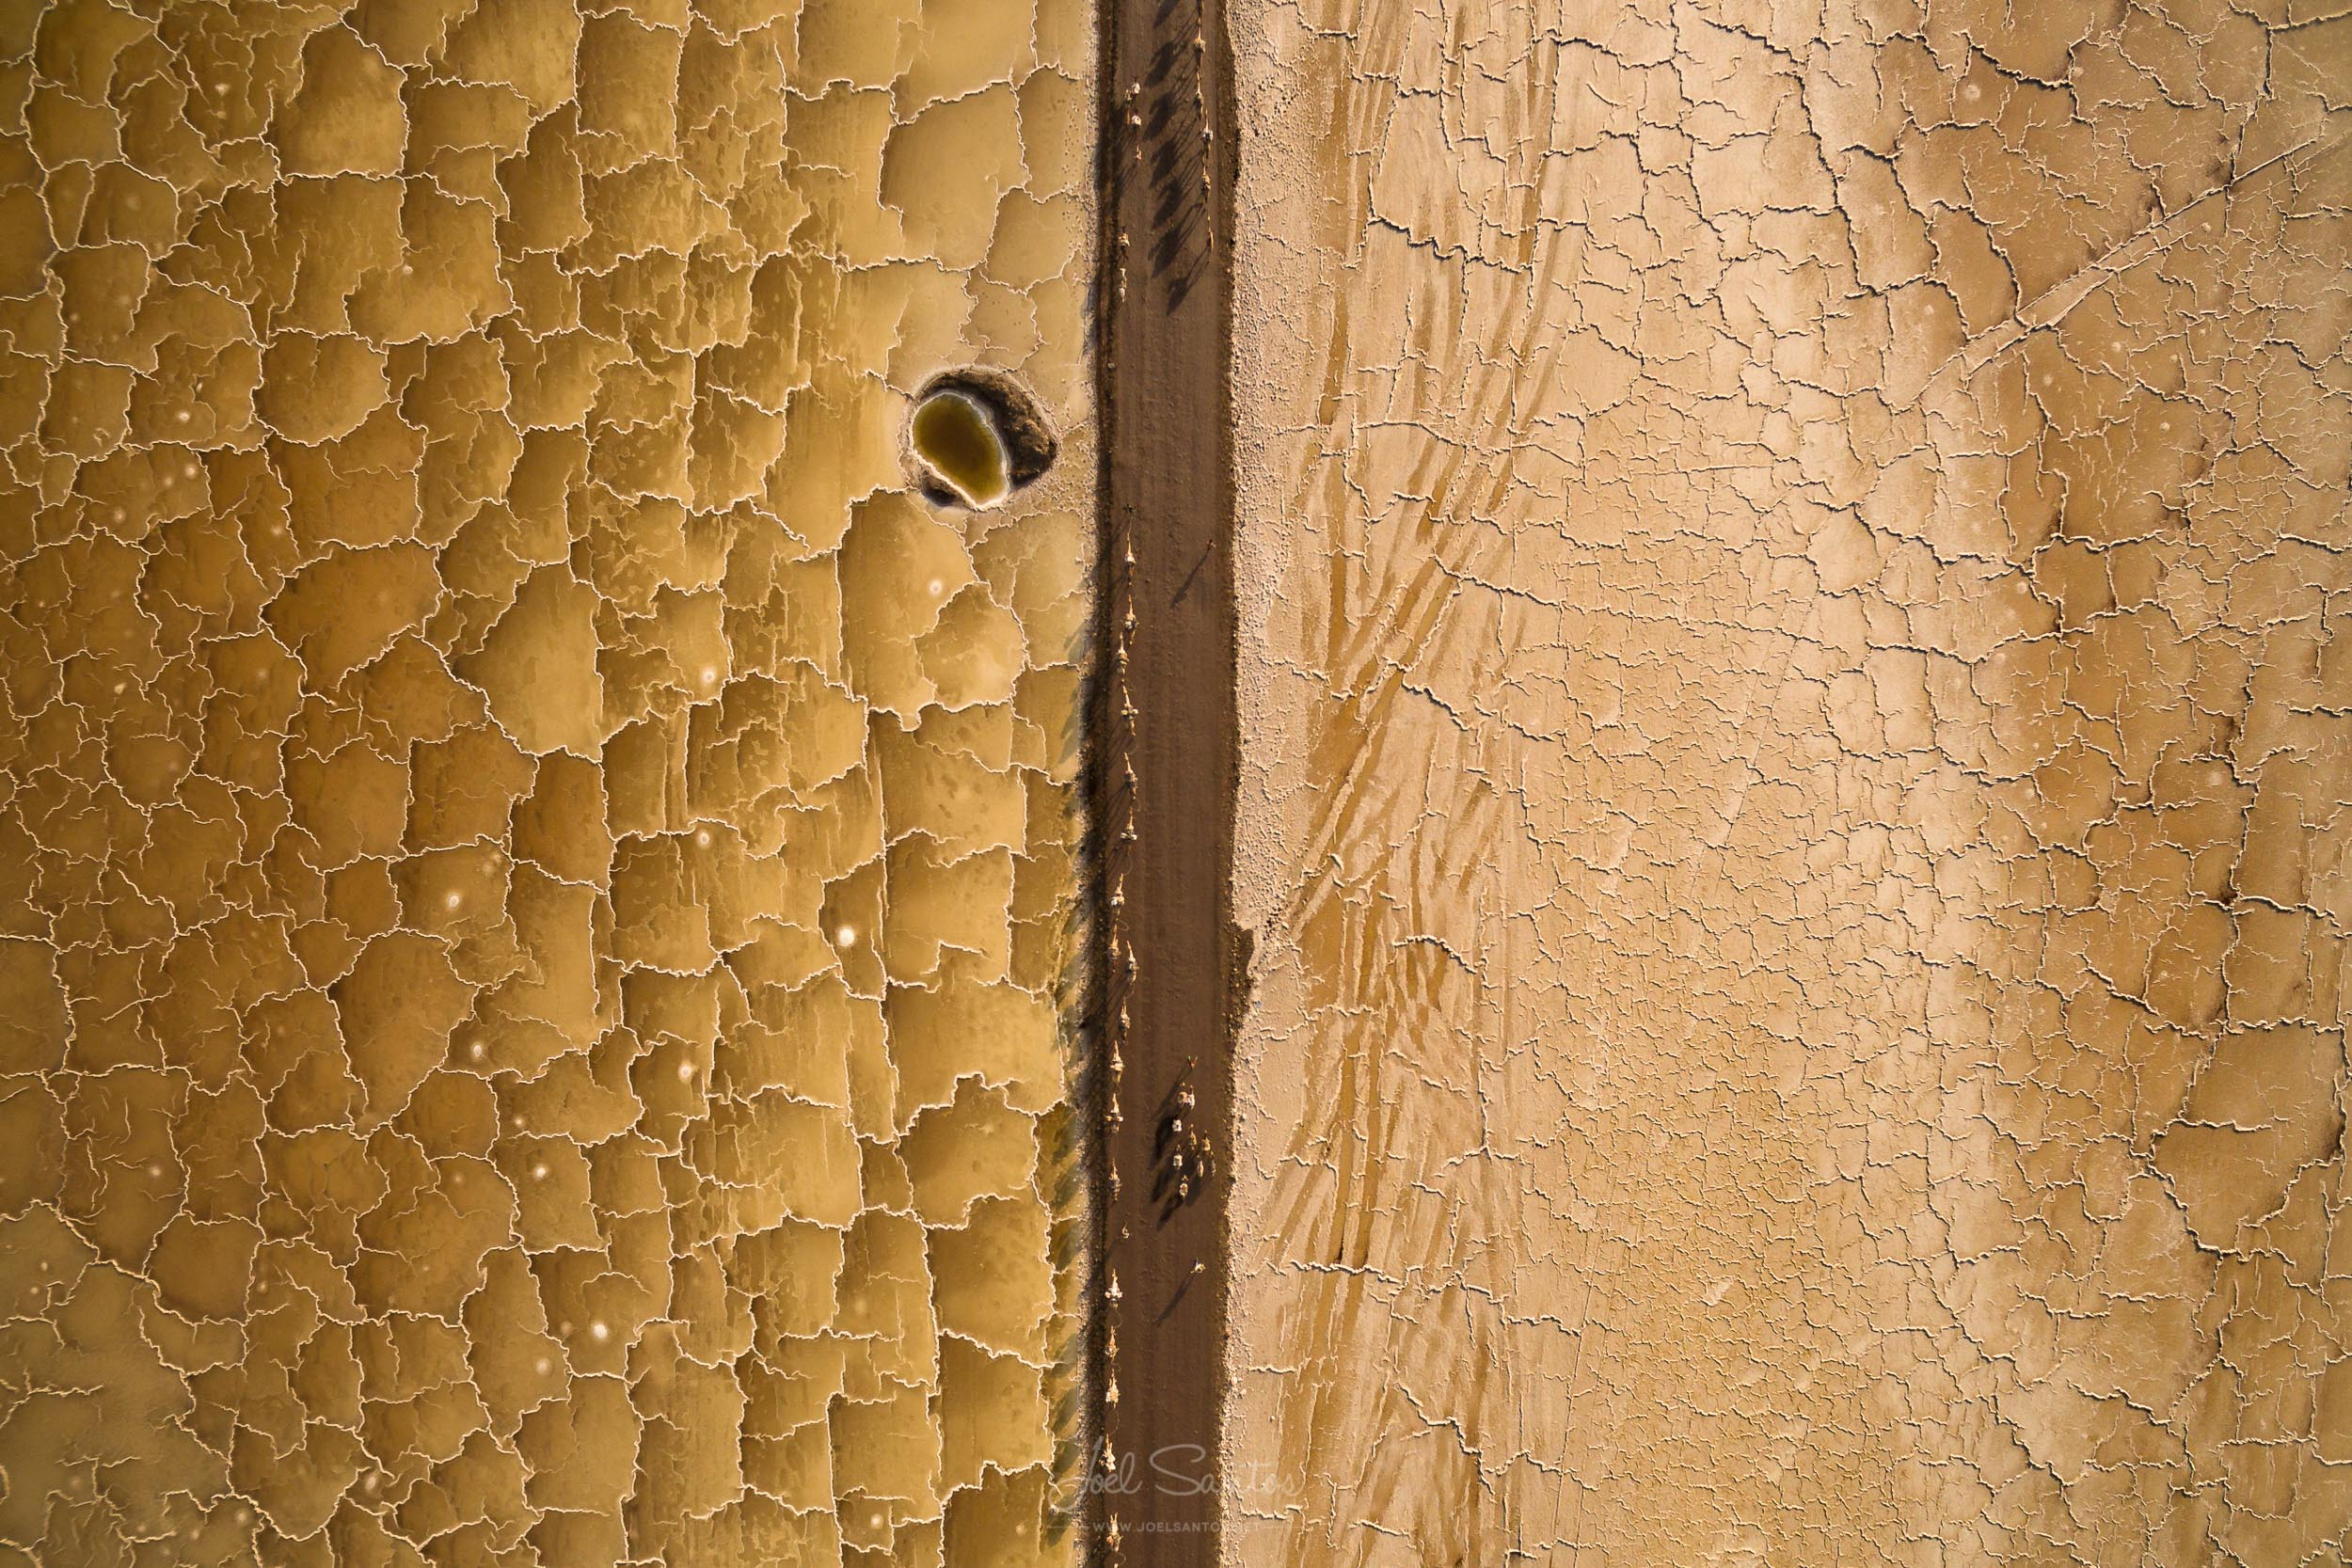 Salt Miner with dromedary caravan and salt patterns, Aerial Imag